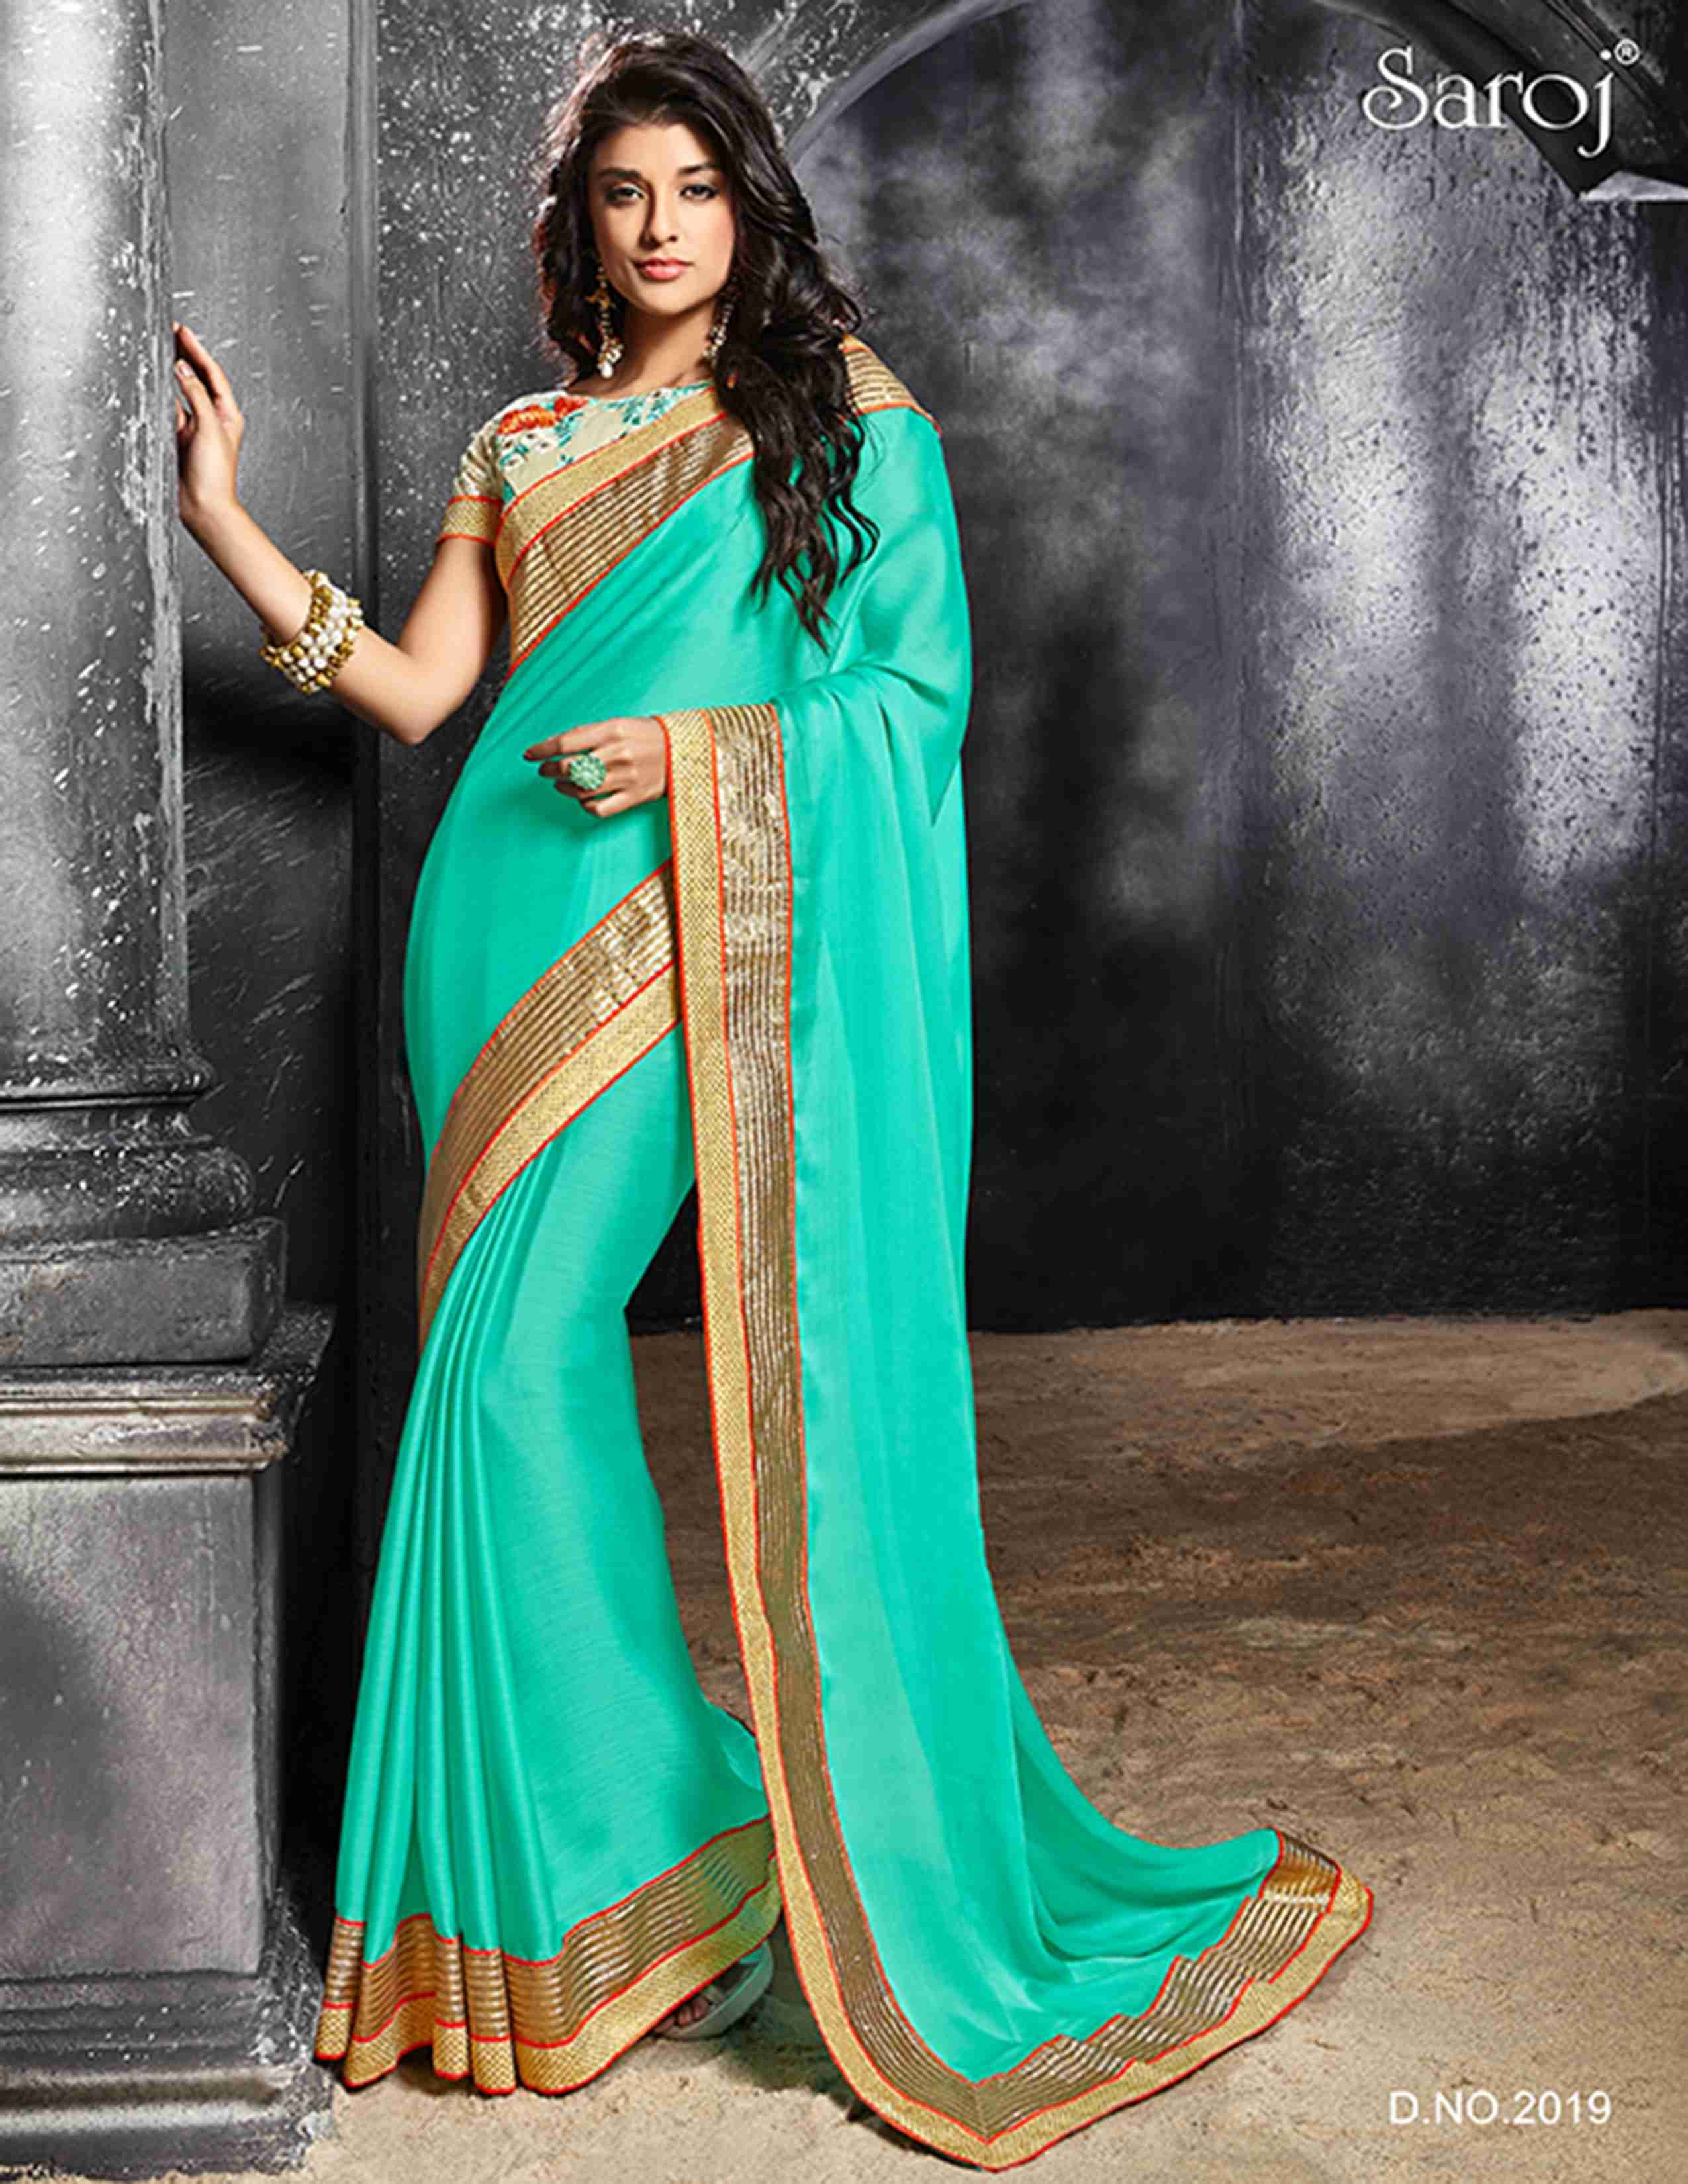 Pin by Sudeep on Beautiful dresses   Pinterest   Saree